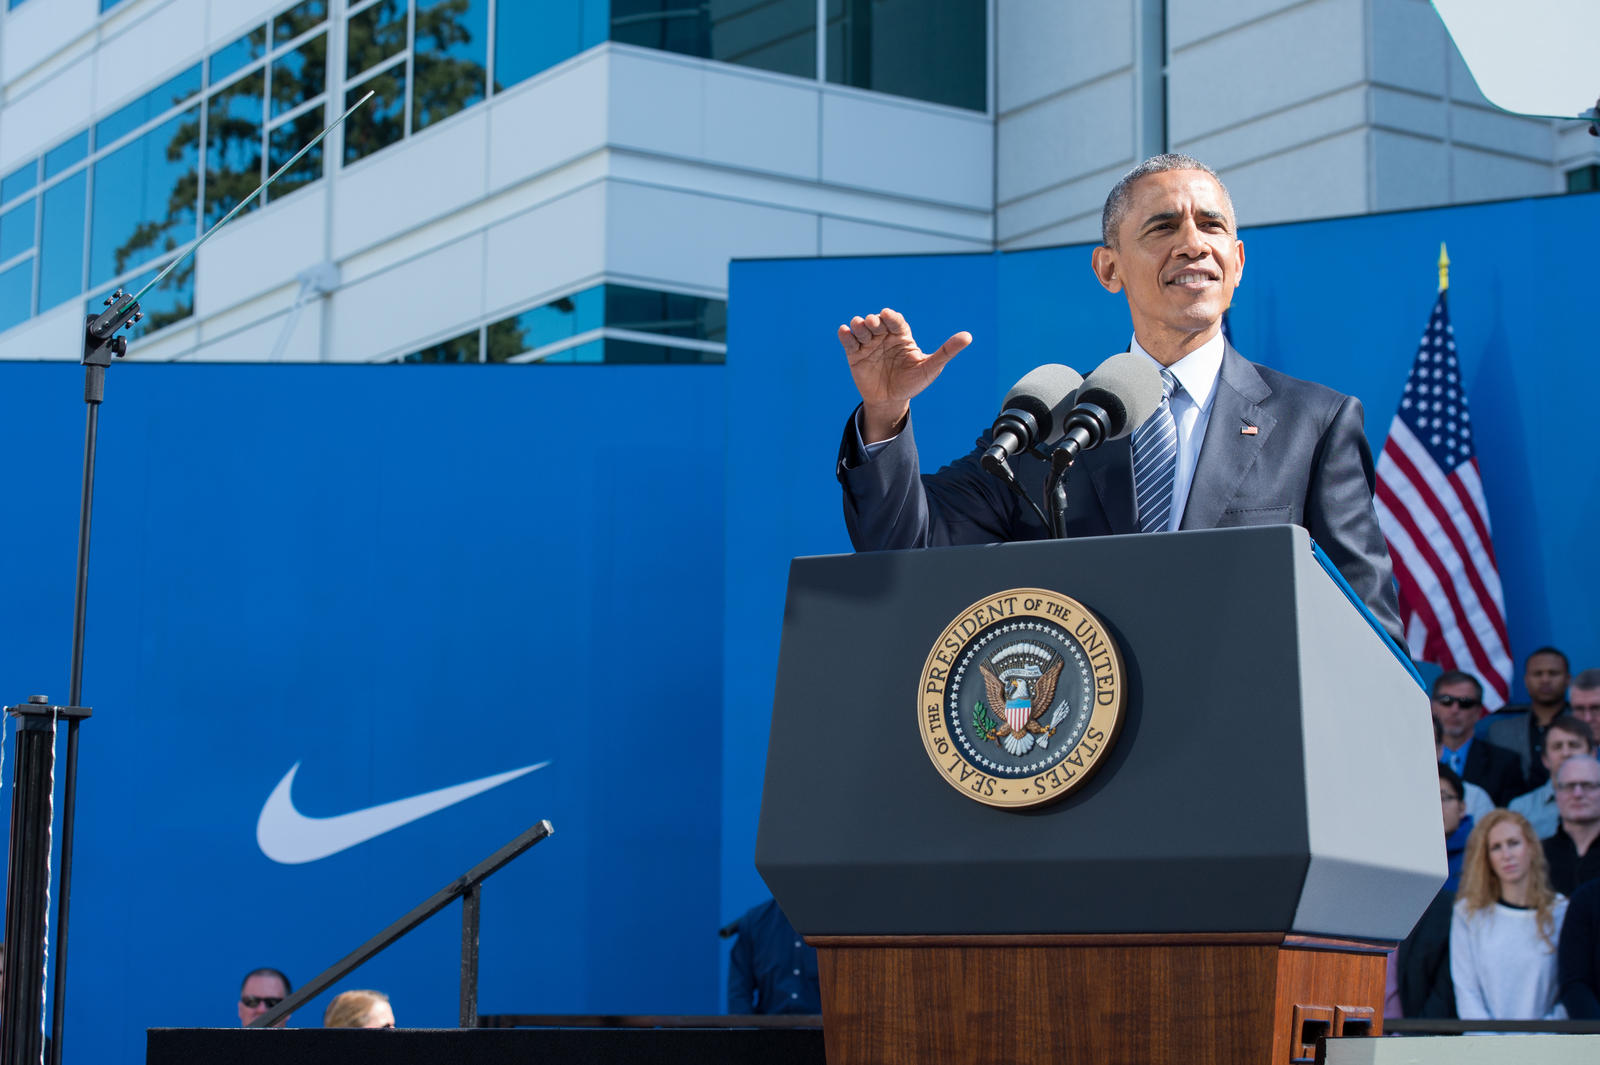 Nike Welcomes President Obama to its World Headquarters